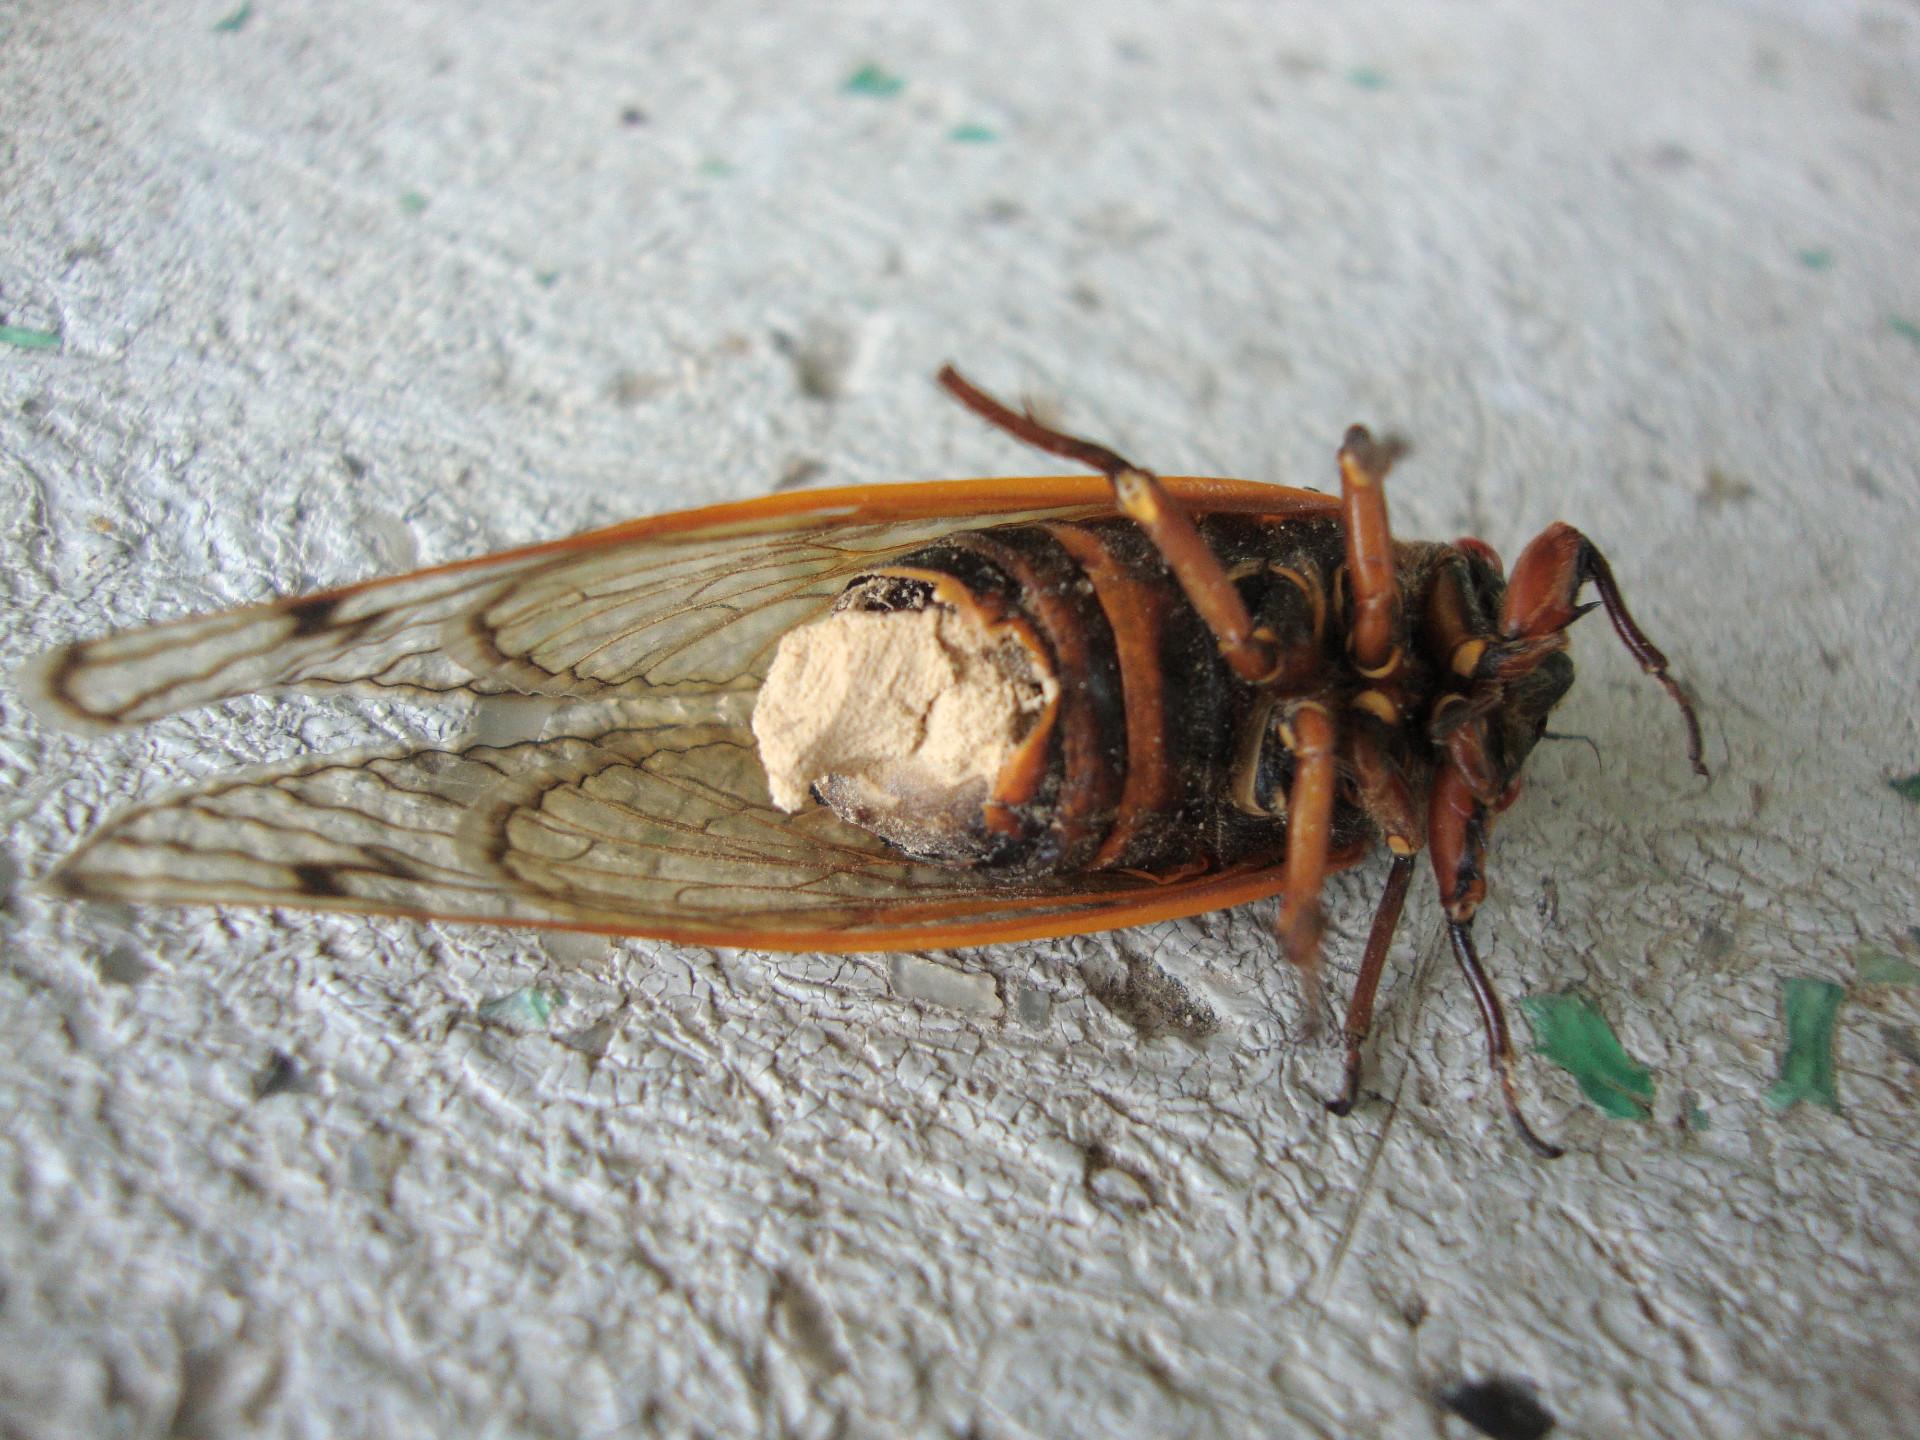 Cigarra zombie, Massospora, insectos